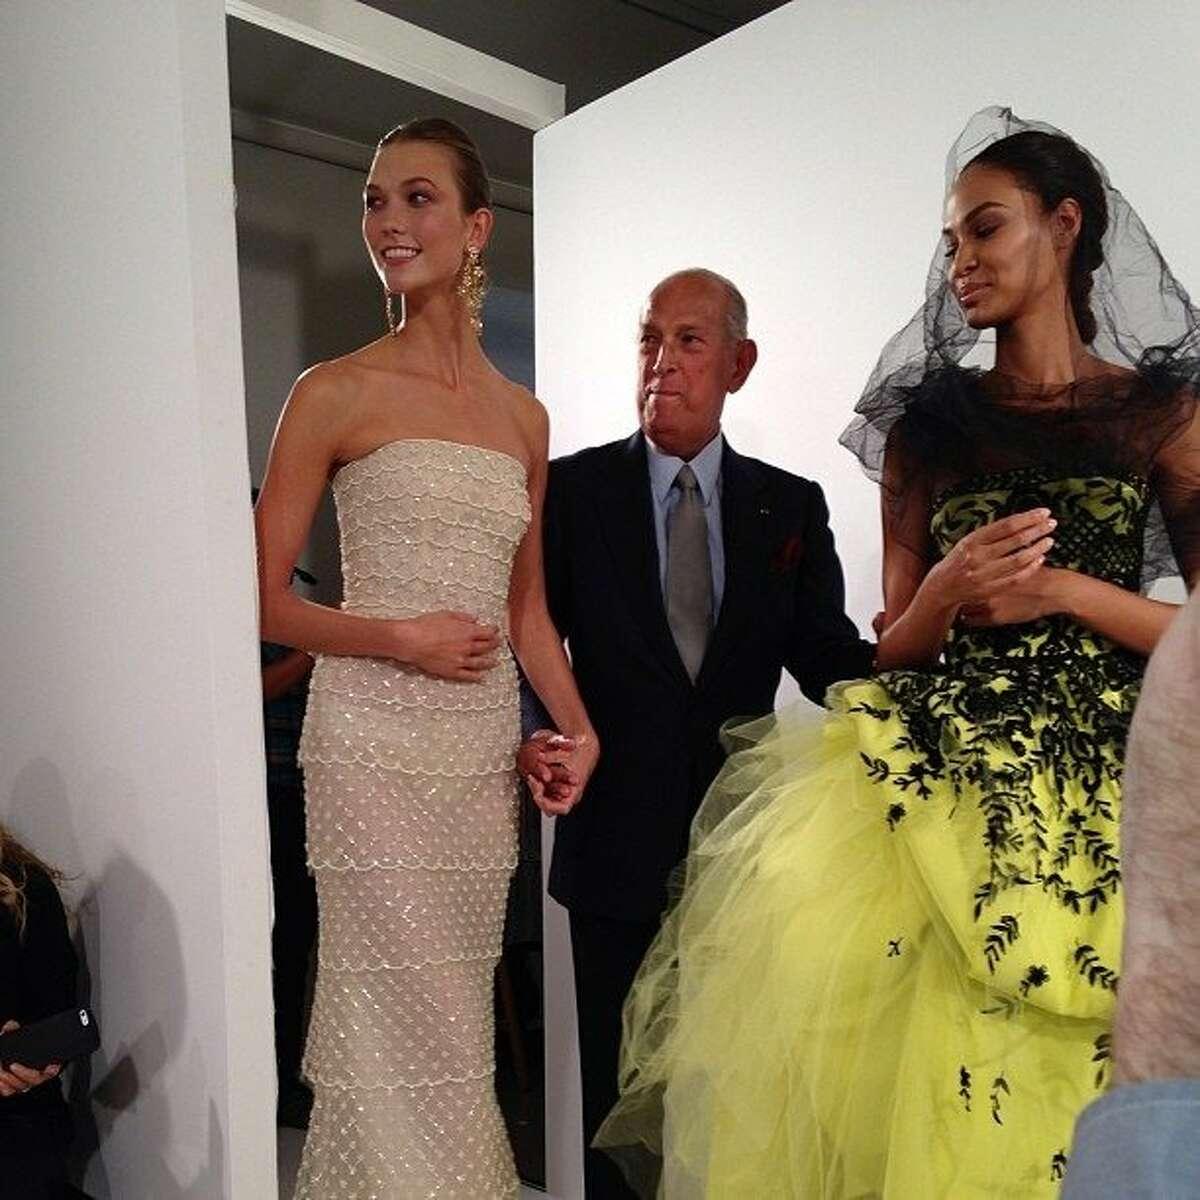 Oscar de la Renta during New York Fashion Week, Tuesday, Sept. 10, 2013.(AP Photo/Samantha Critchell)